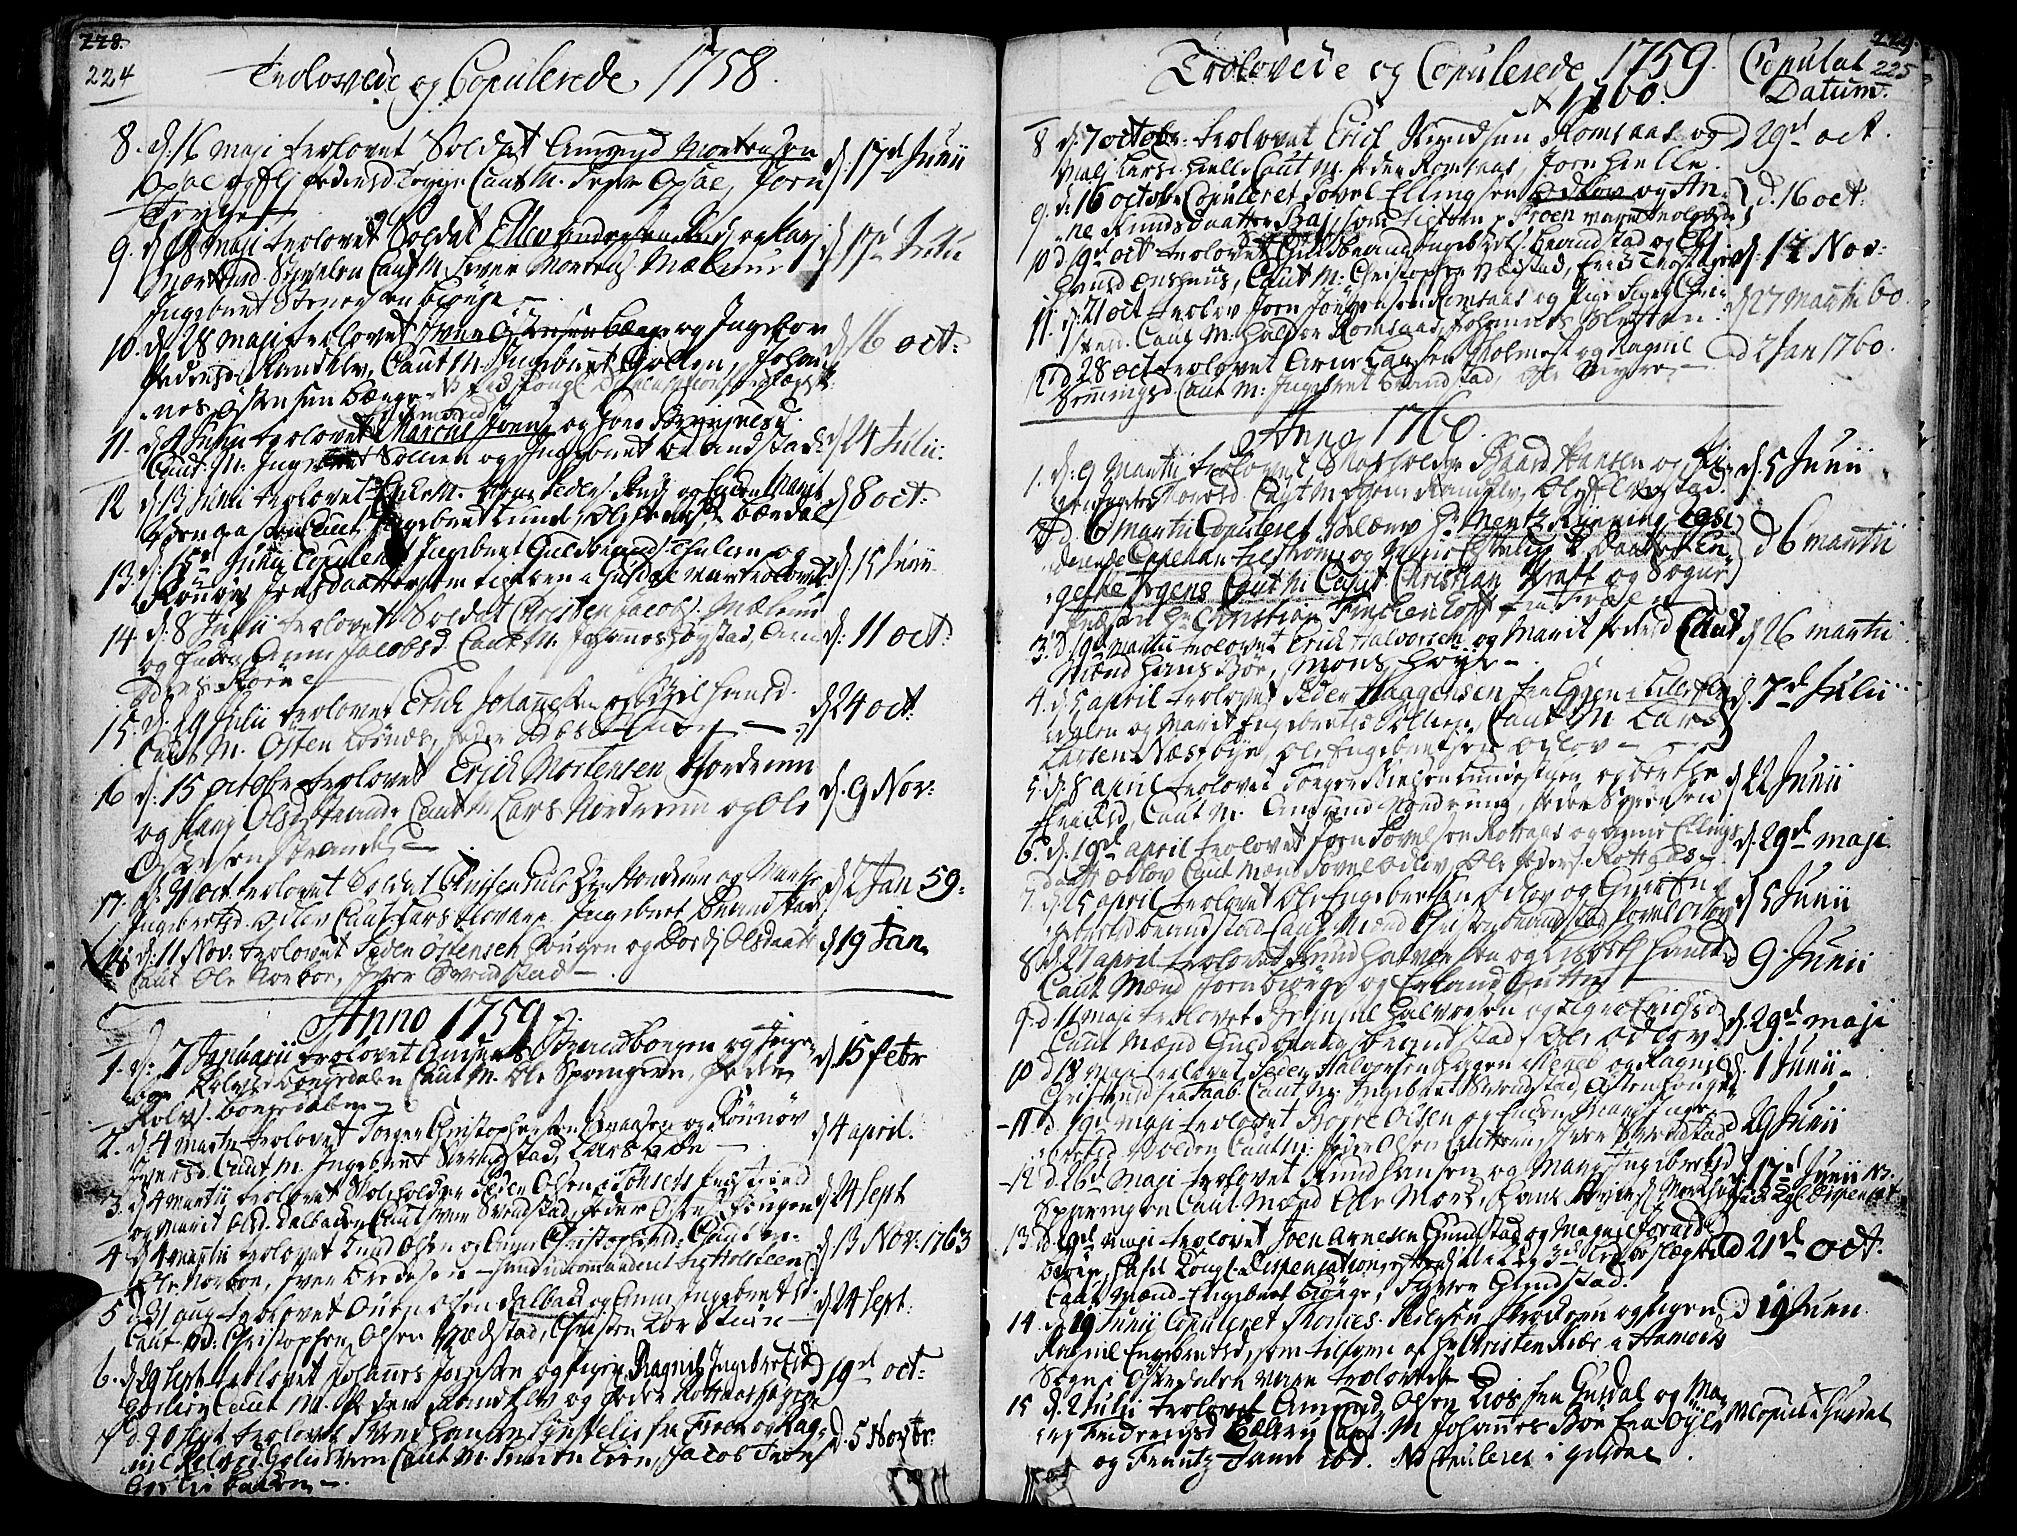 SAH, Ringebu prestekontor, Ministerialbok nr. 2, 1734-1780, s. 224-225